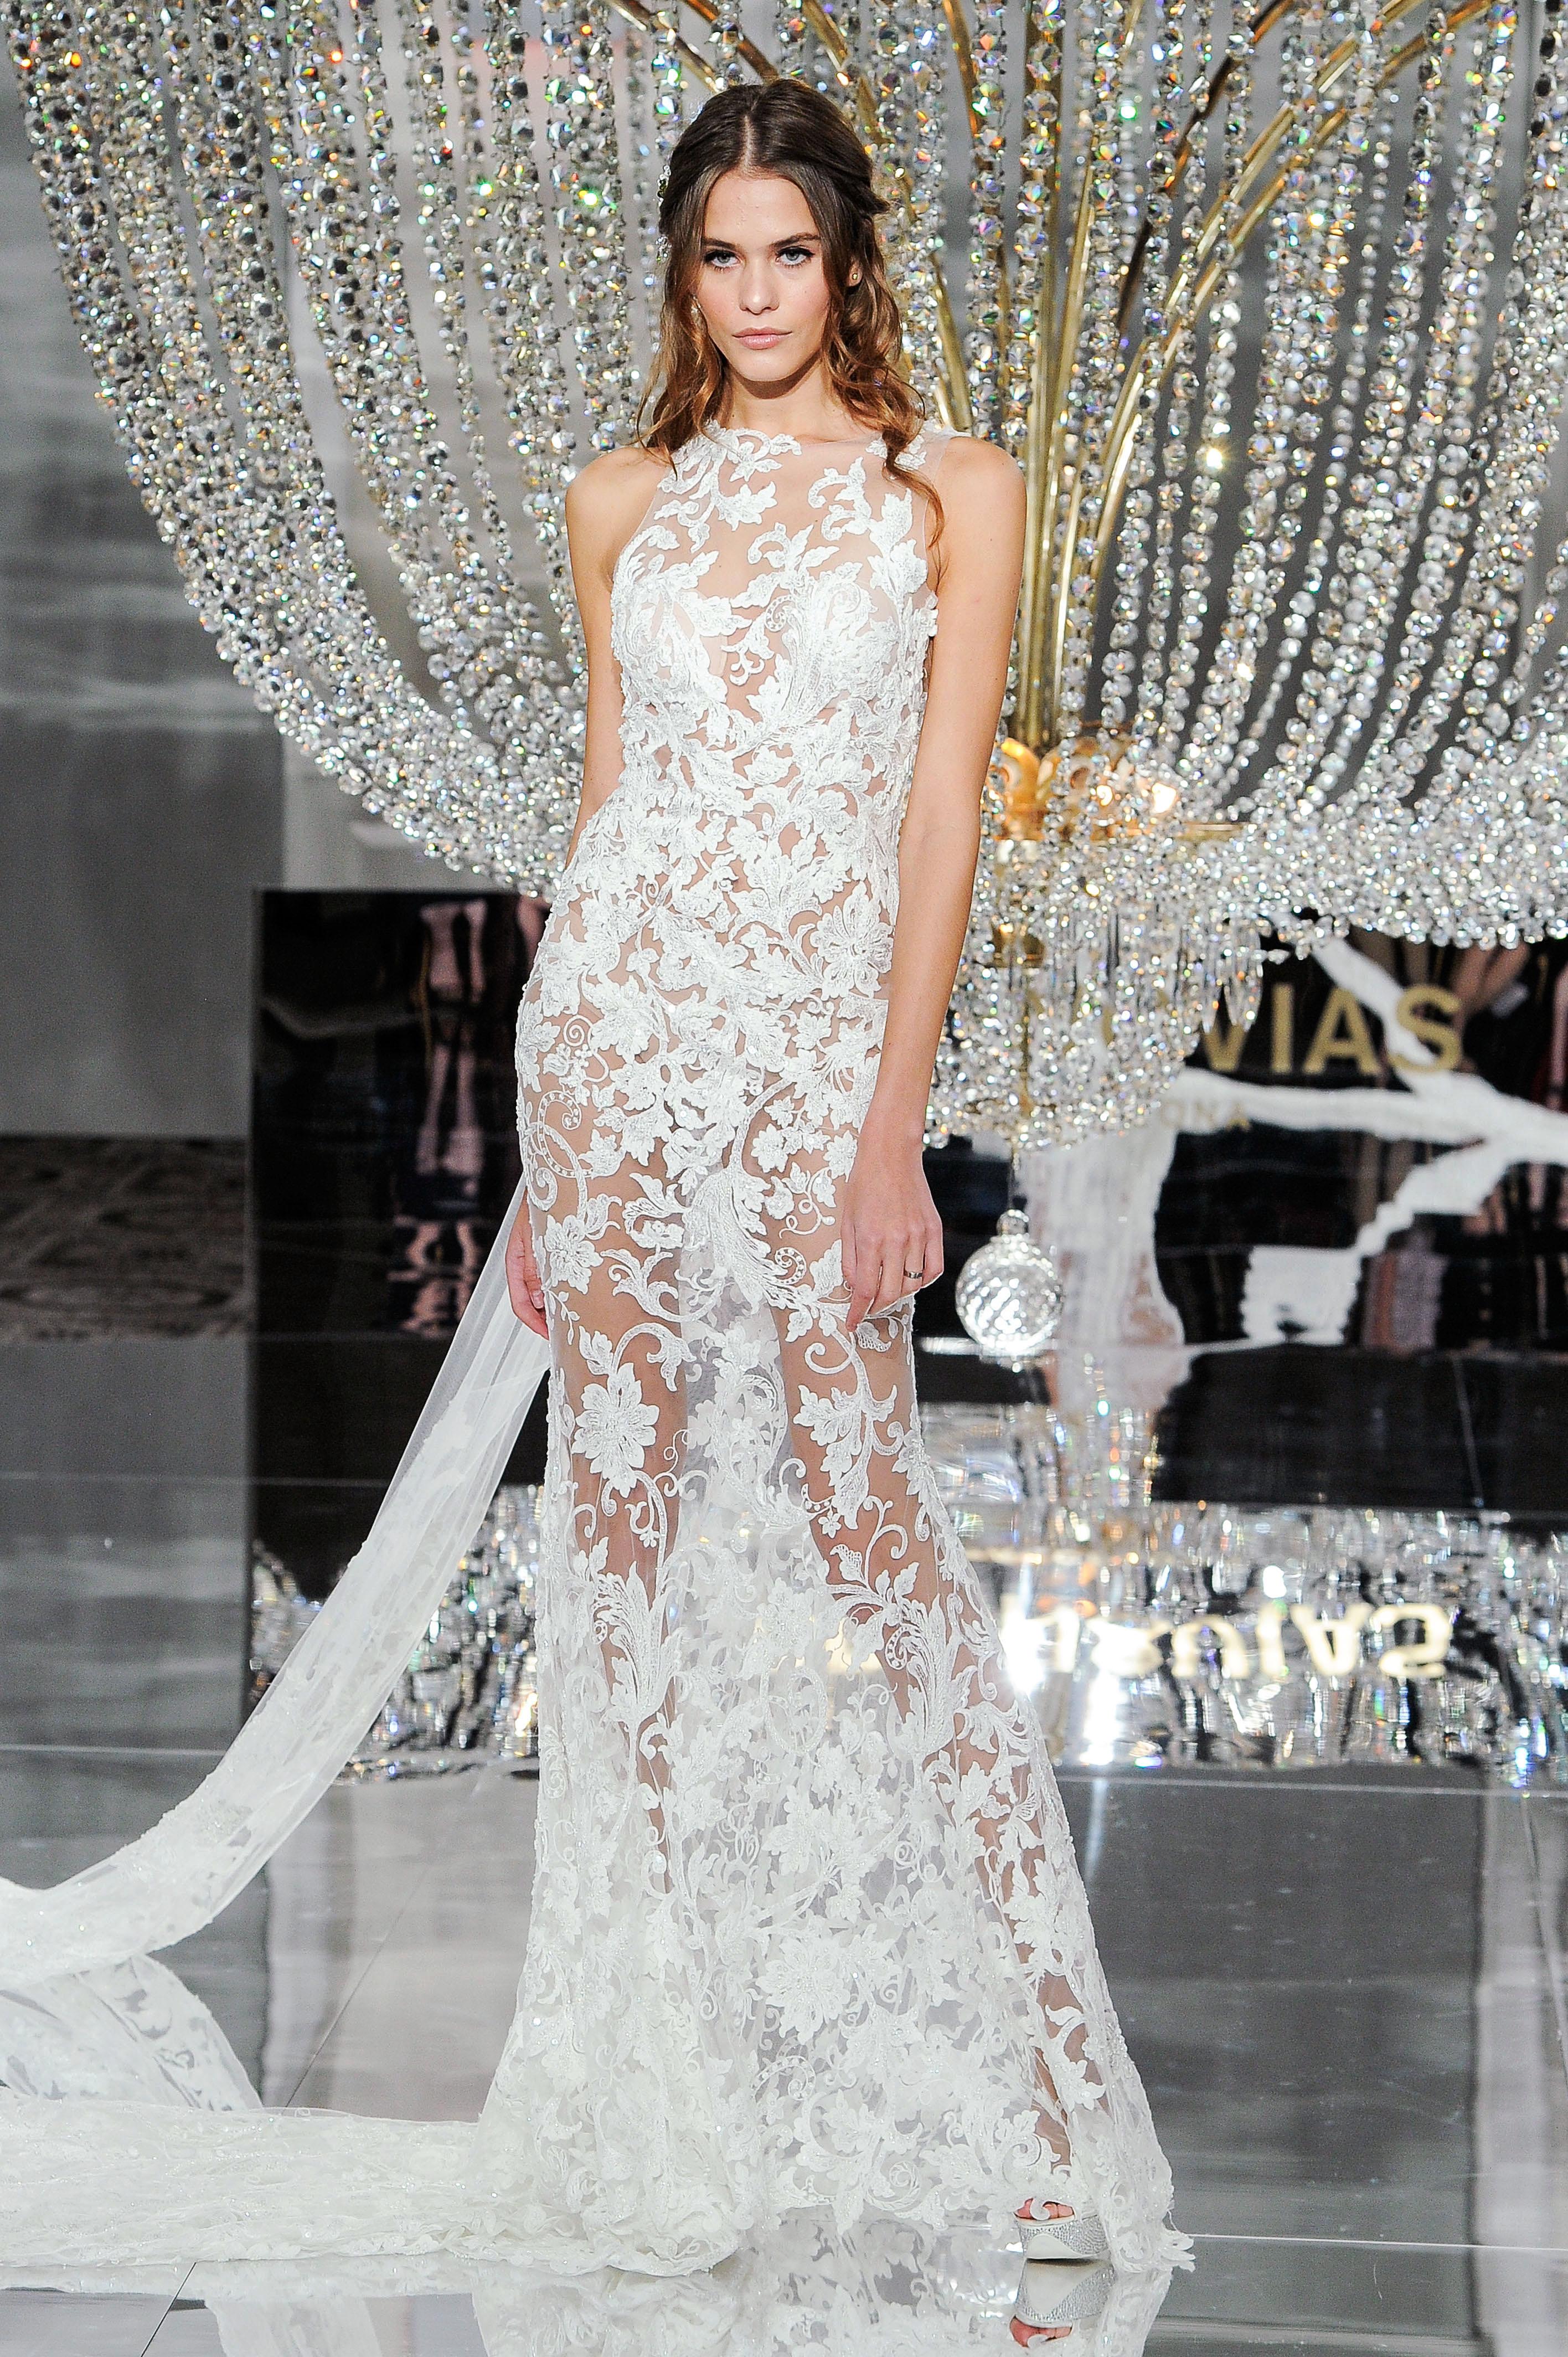 pronovias wedding dress fall 2018 sleeveless sheer high neck lace